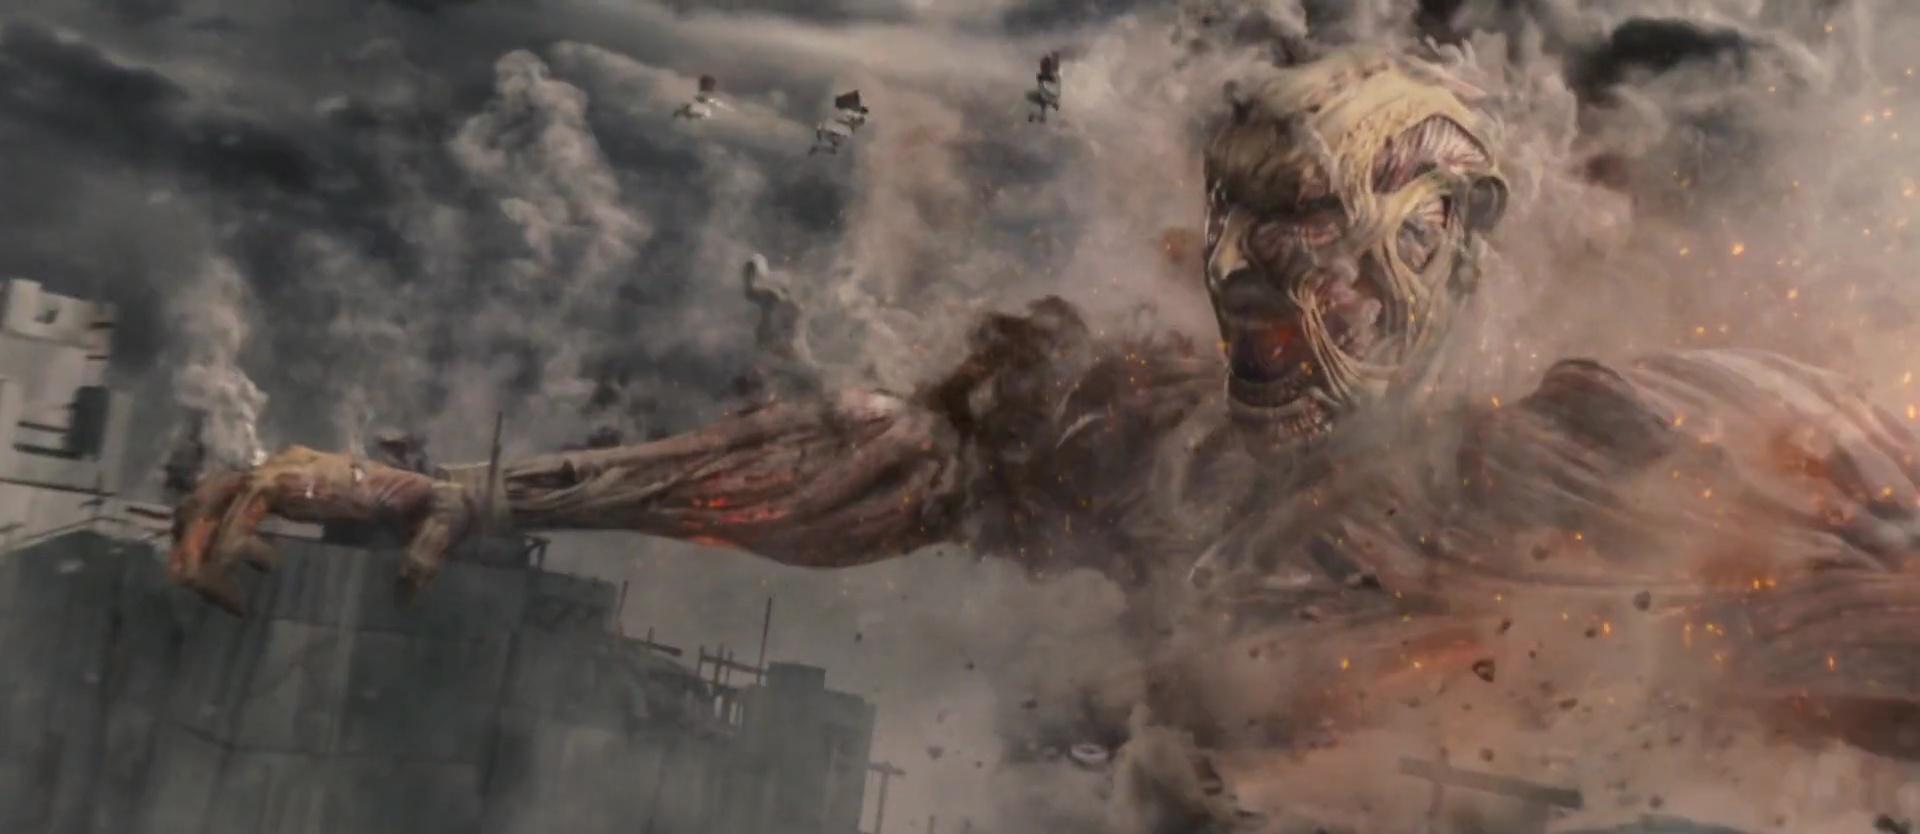 ATTACK ON TITAN: END OF THE WORLD (進撃の巨人 ATTACK ON TITAN エンド オブ ザ ワールド) de Higushi Shinji (2015)